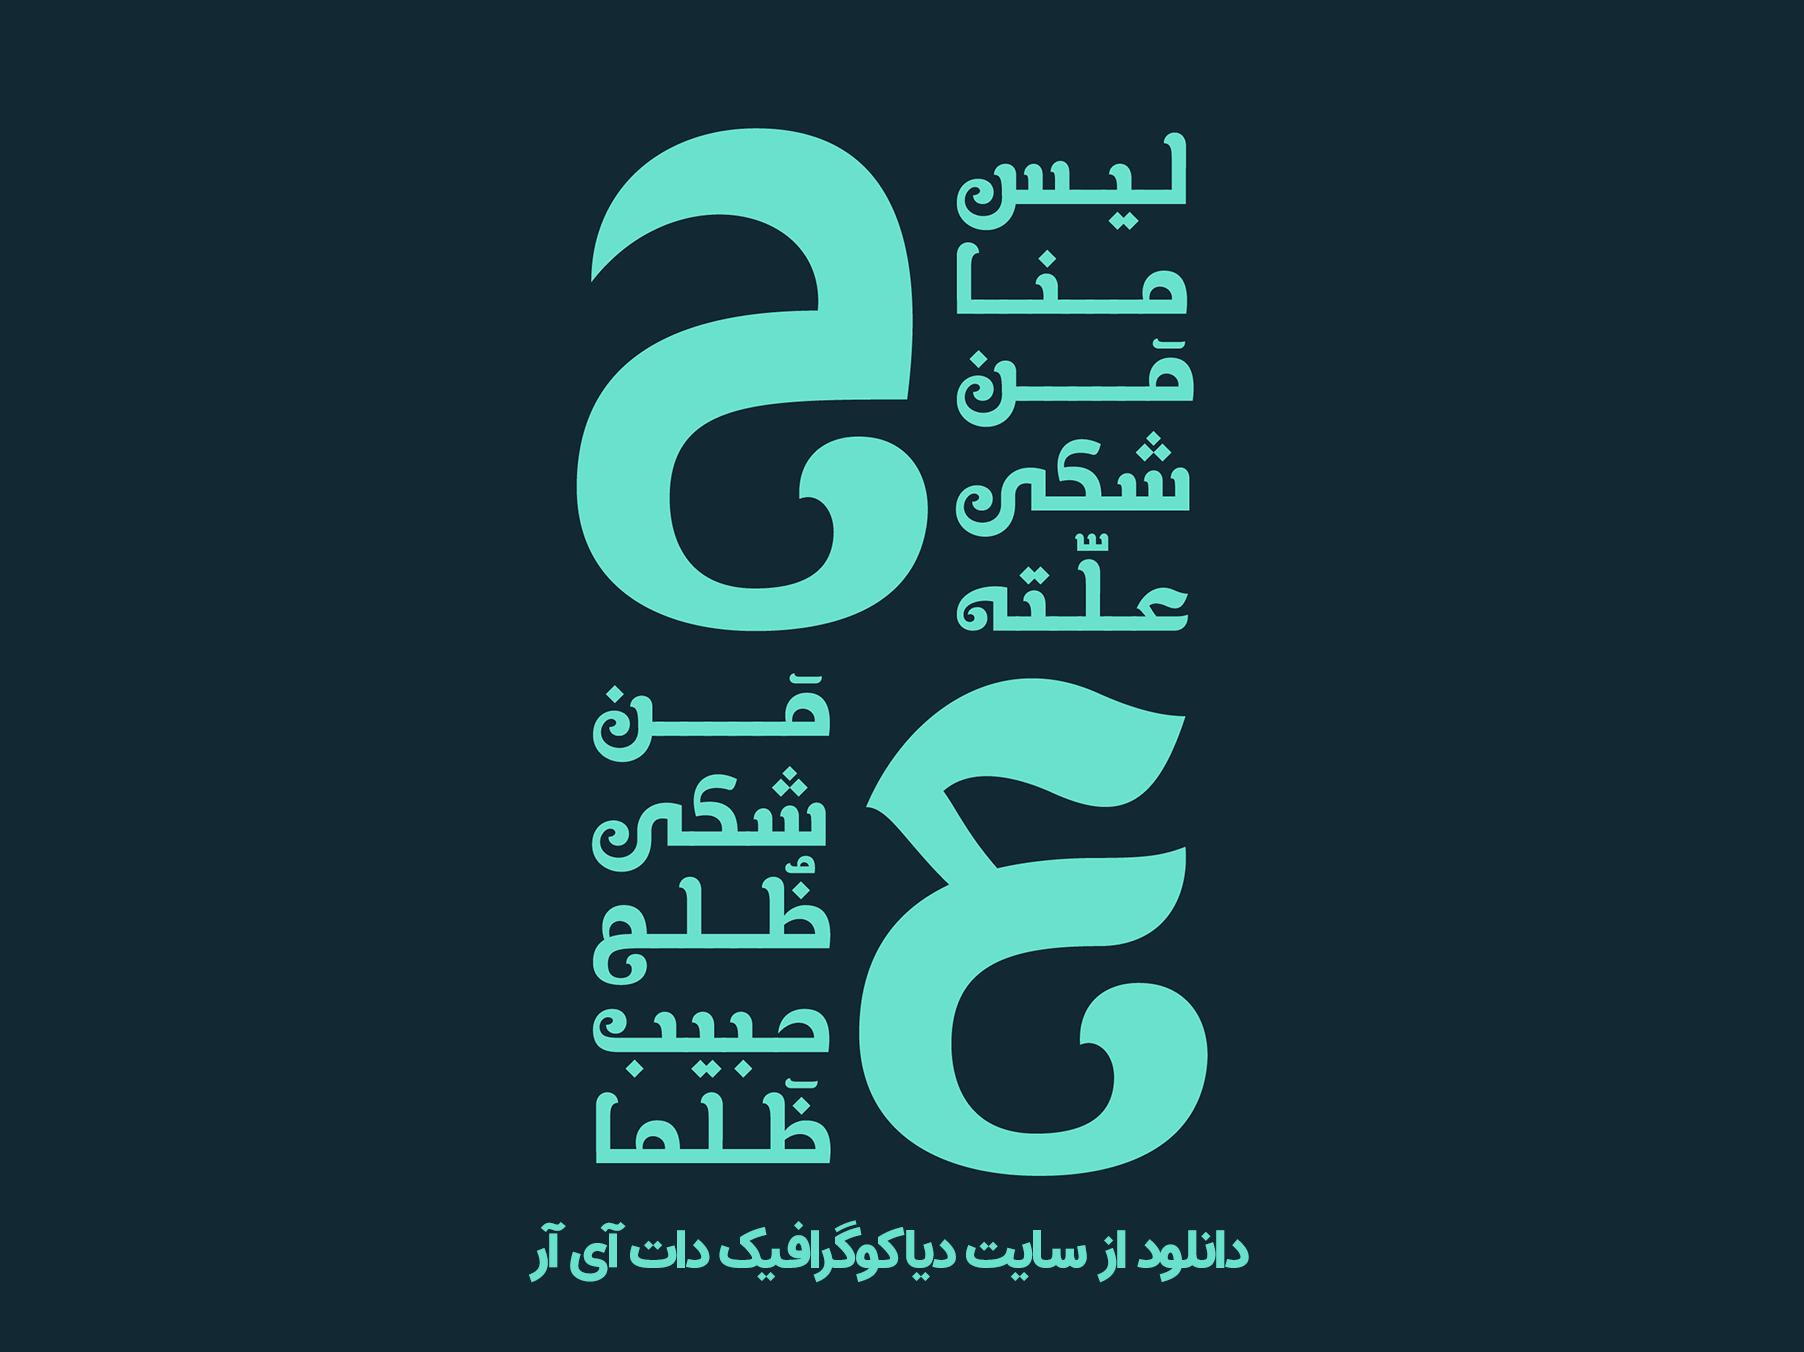 دانلود فونت عربی خلاب